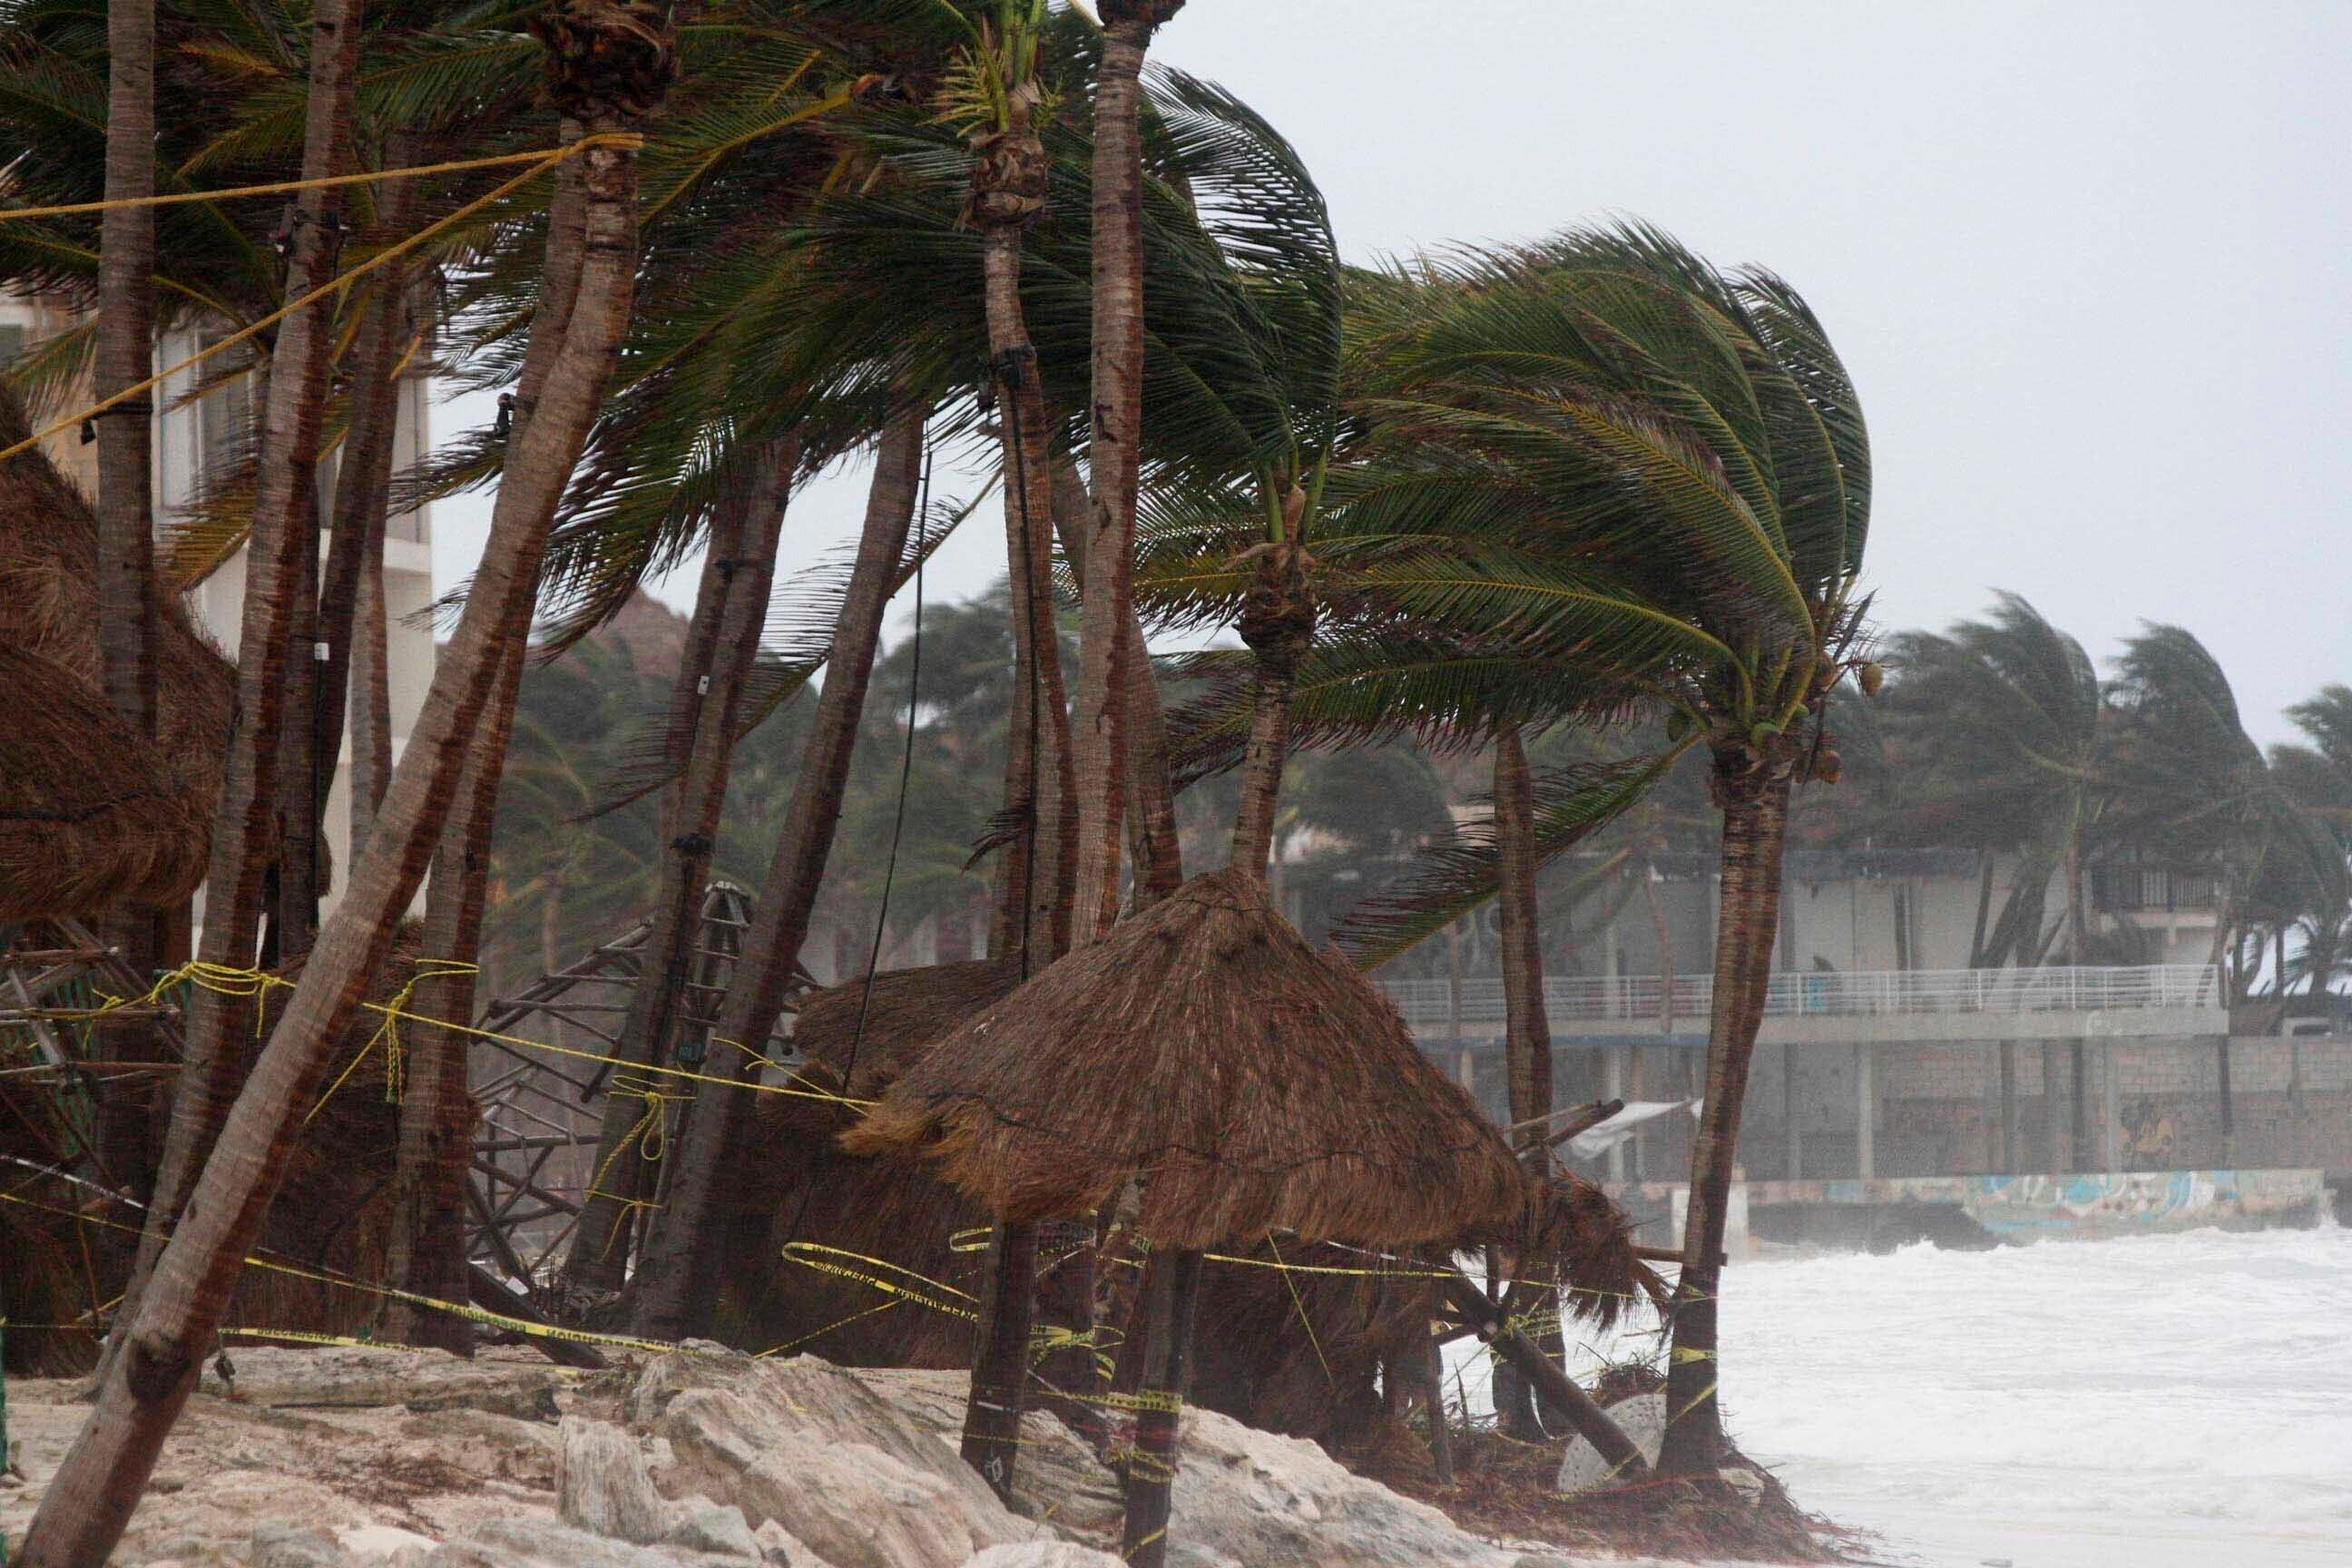 Tropical Storm Zeta forecast to regain hurricane strength before Gulf Coast landfall on Wednesday